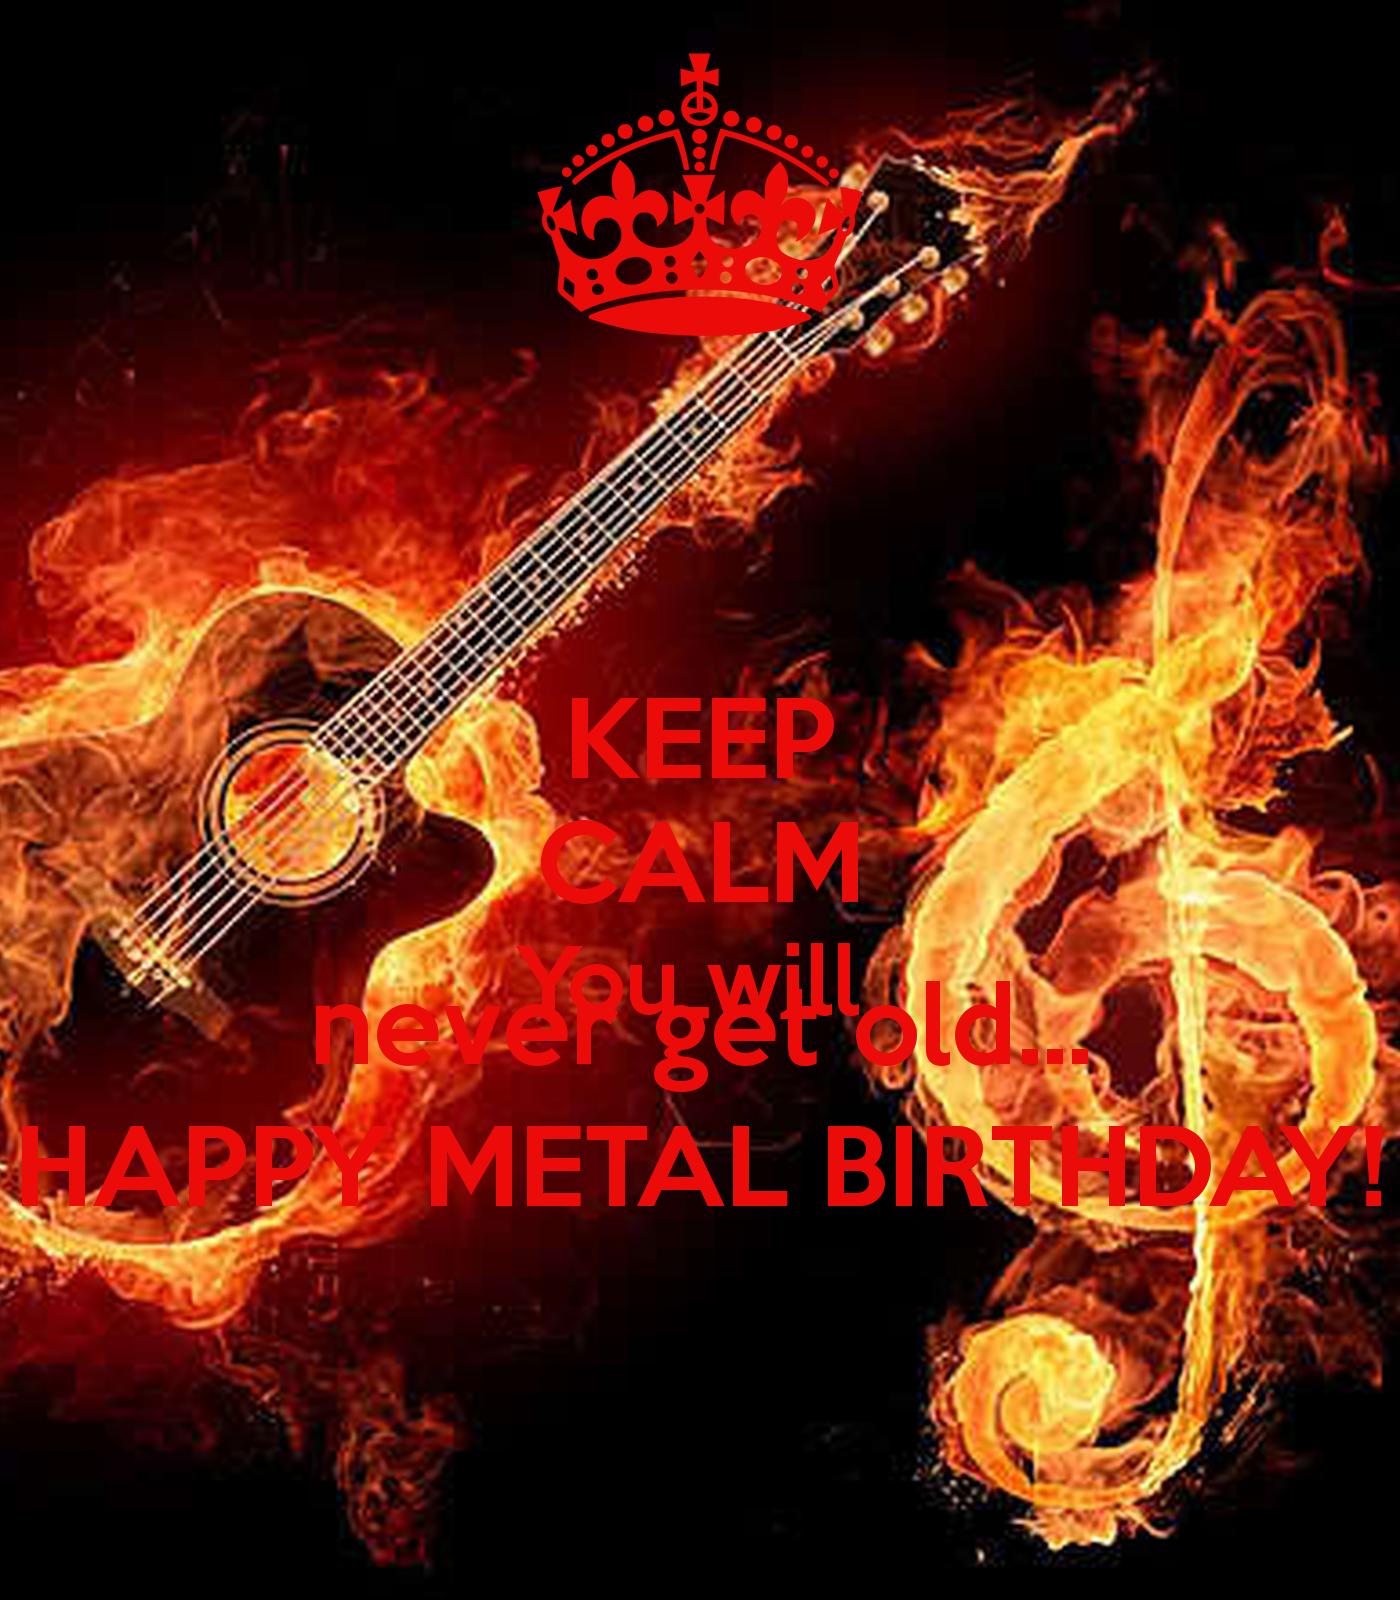 Heavy Metal Birthday Quotes Quotesgram